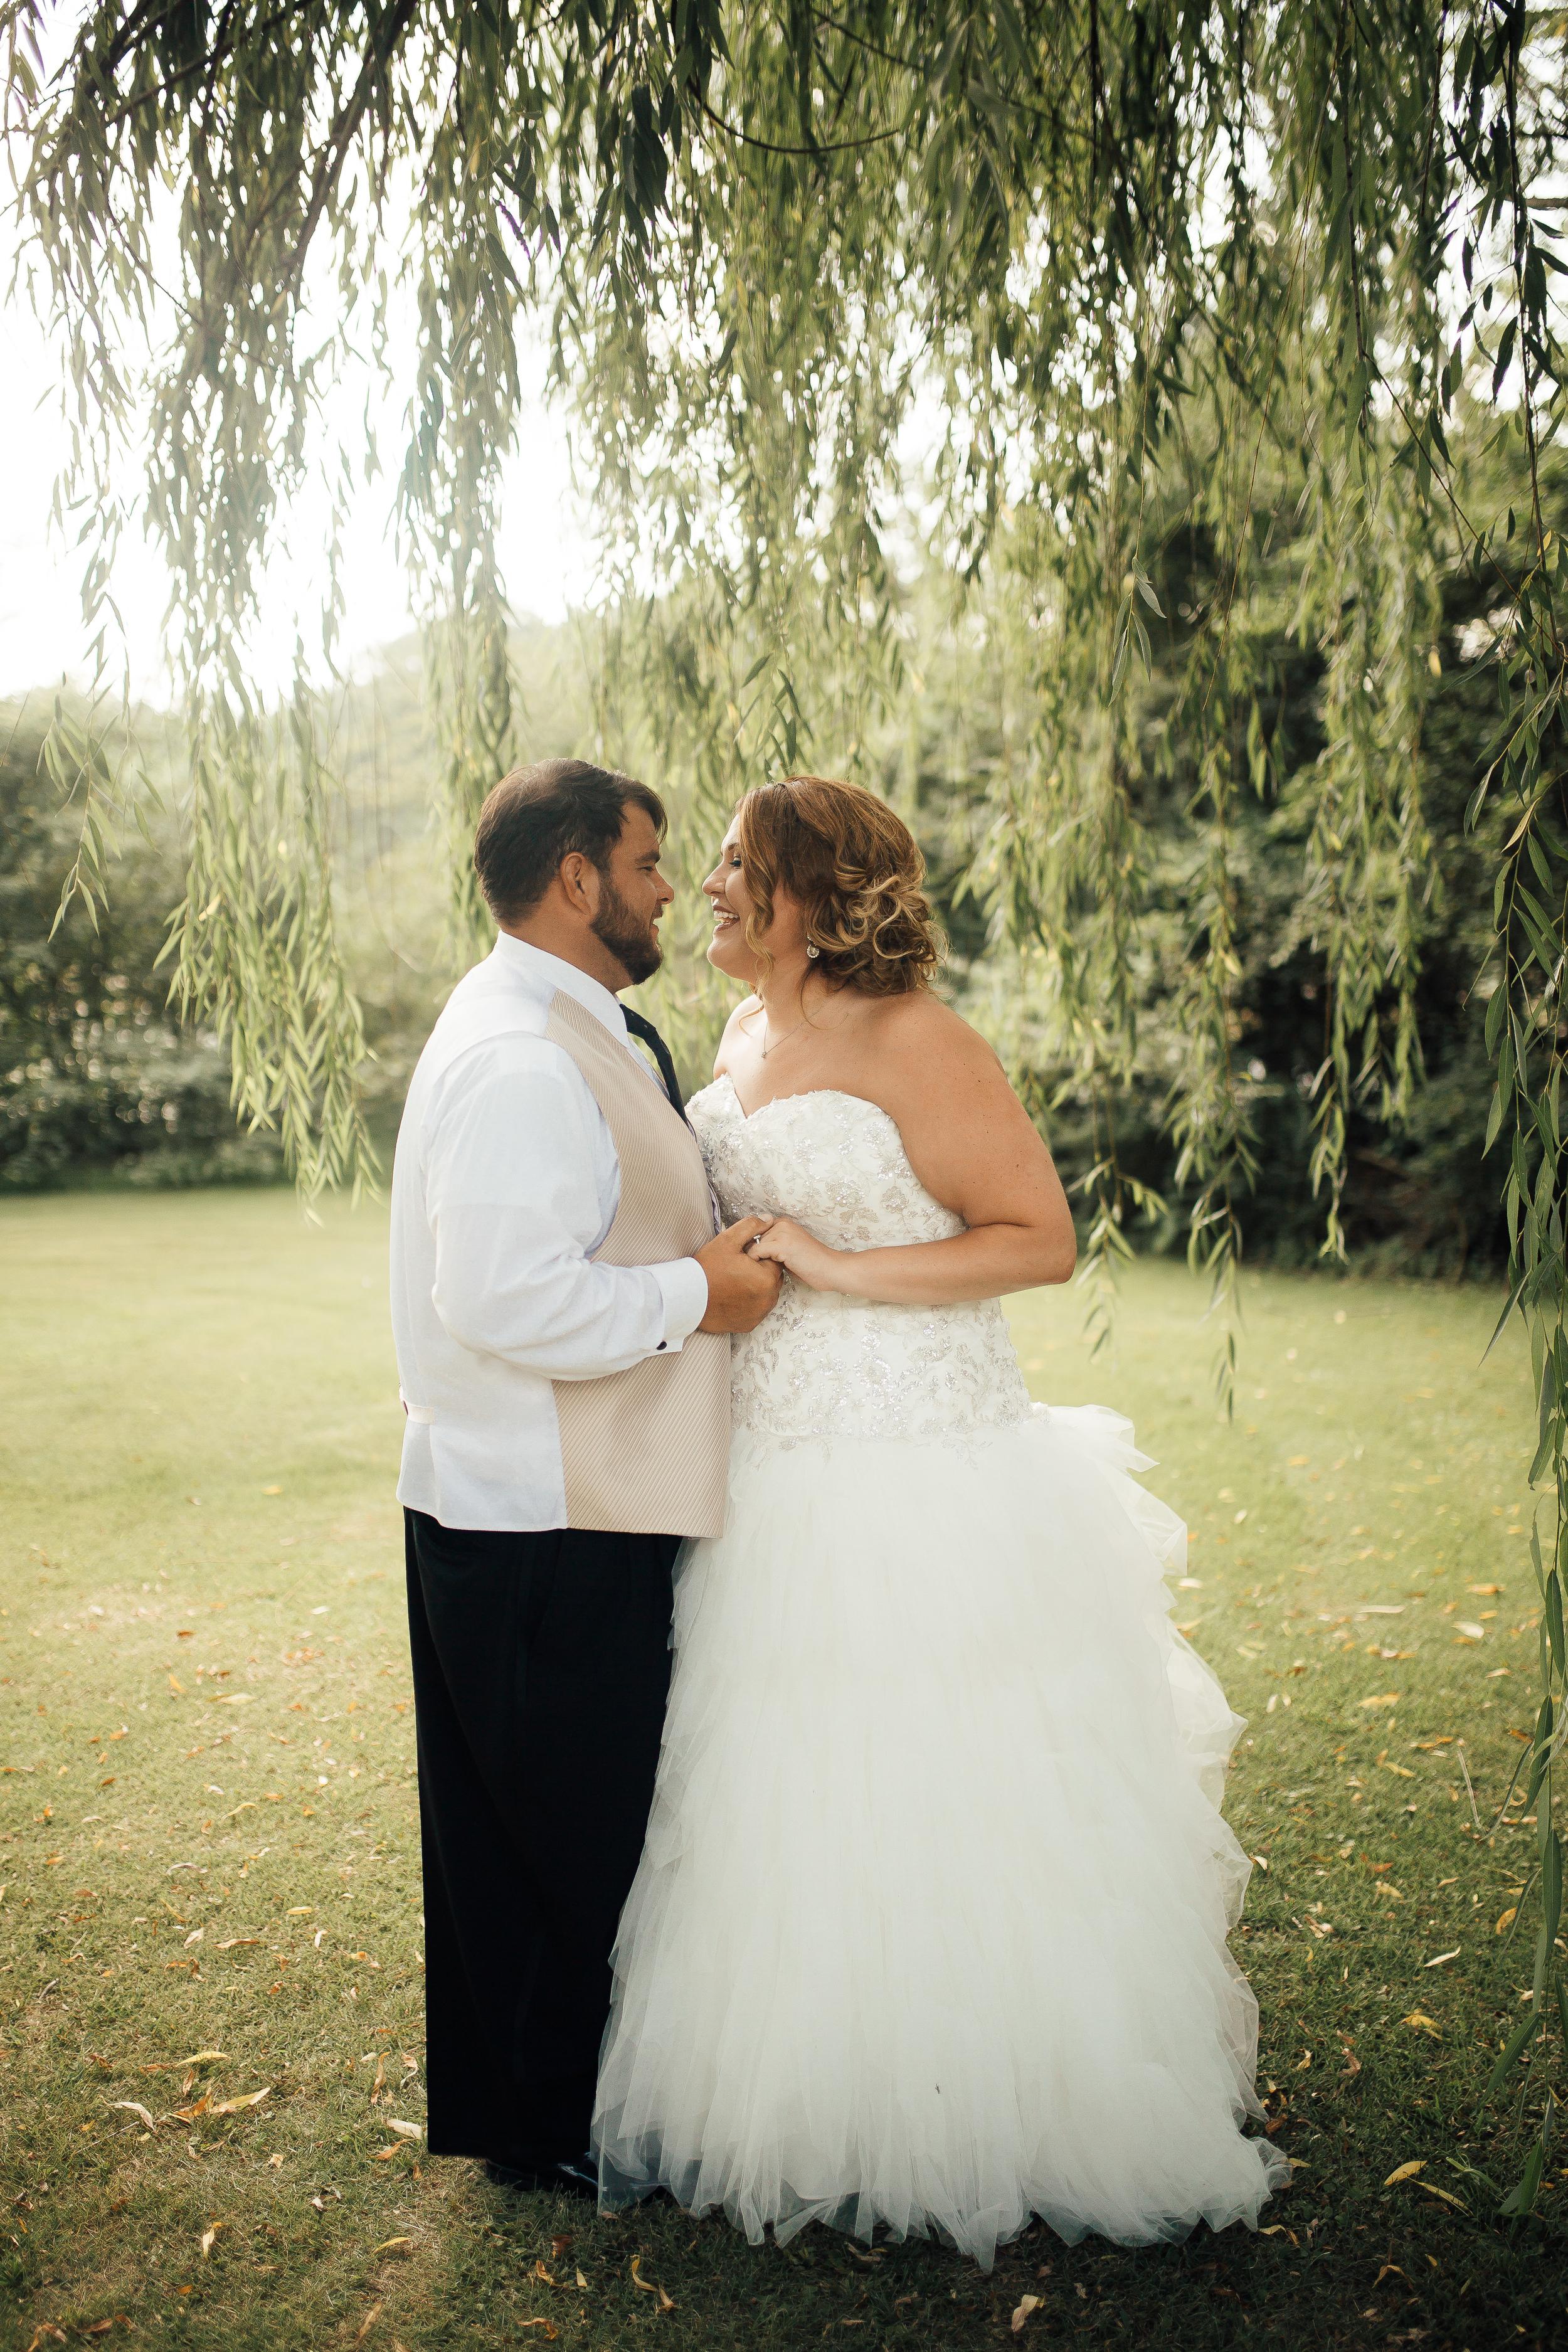 cassie-cook-photography-memphis-wedding-photography-fountain-south-inn